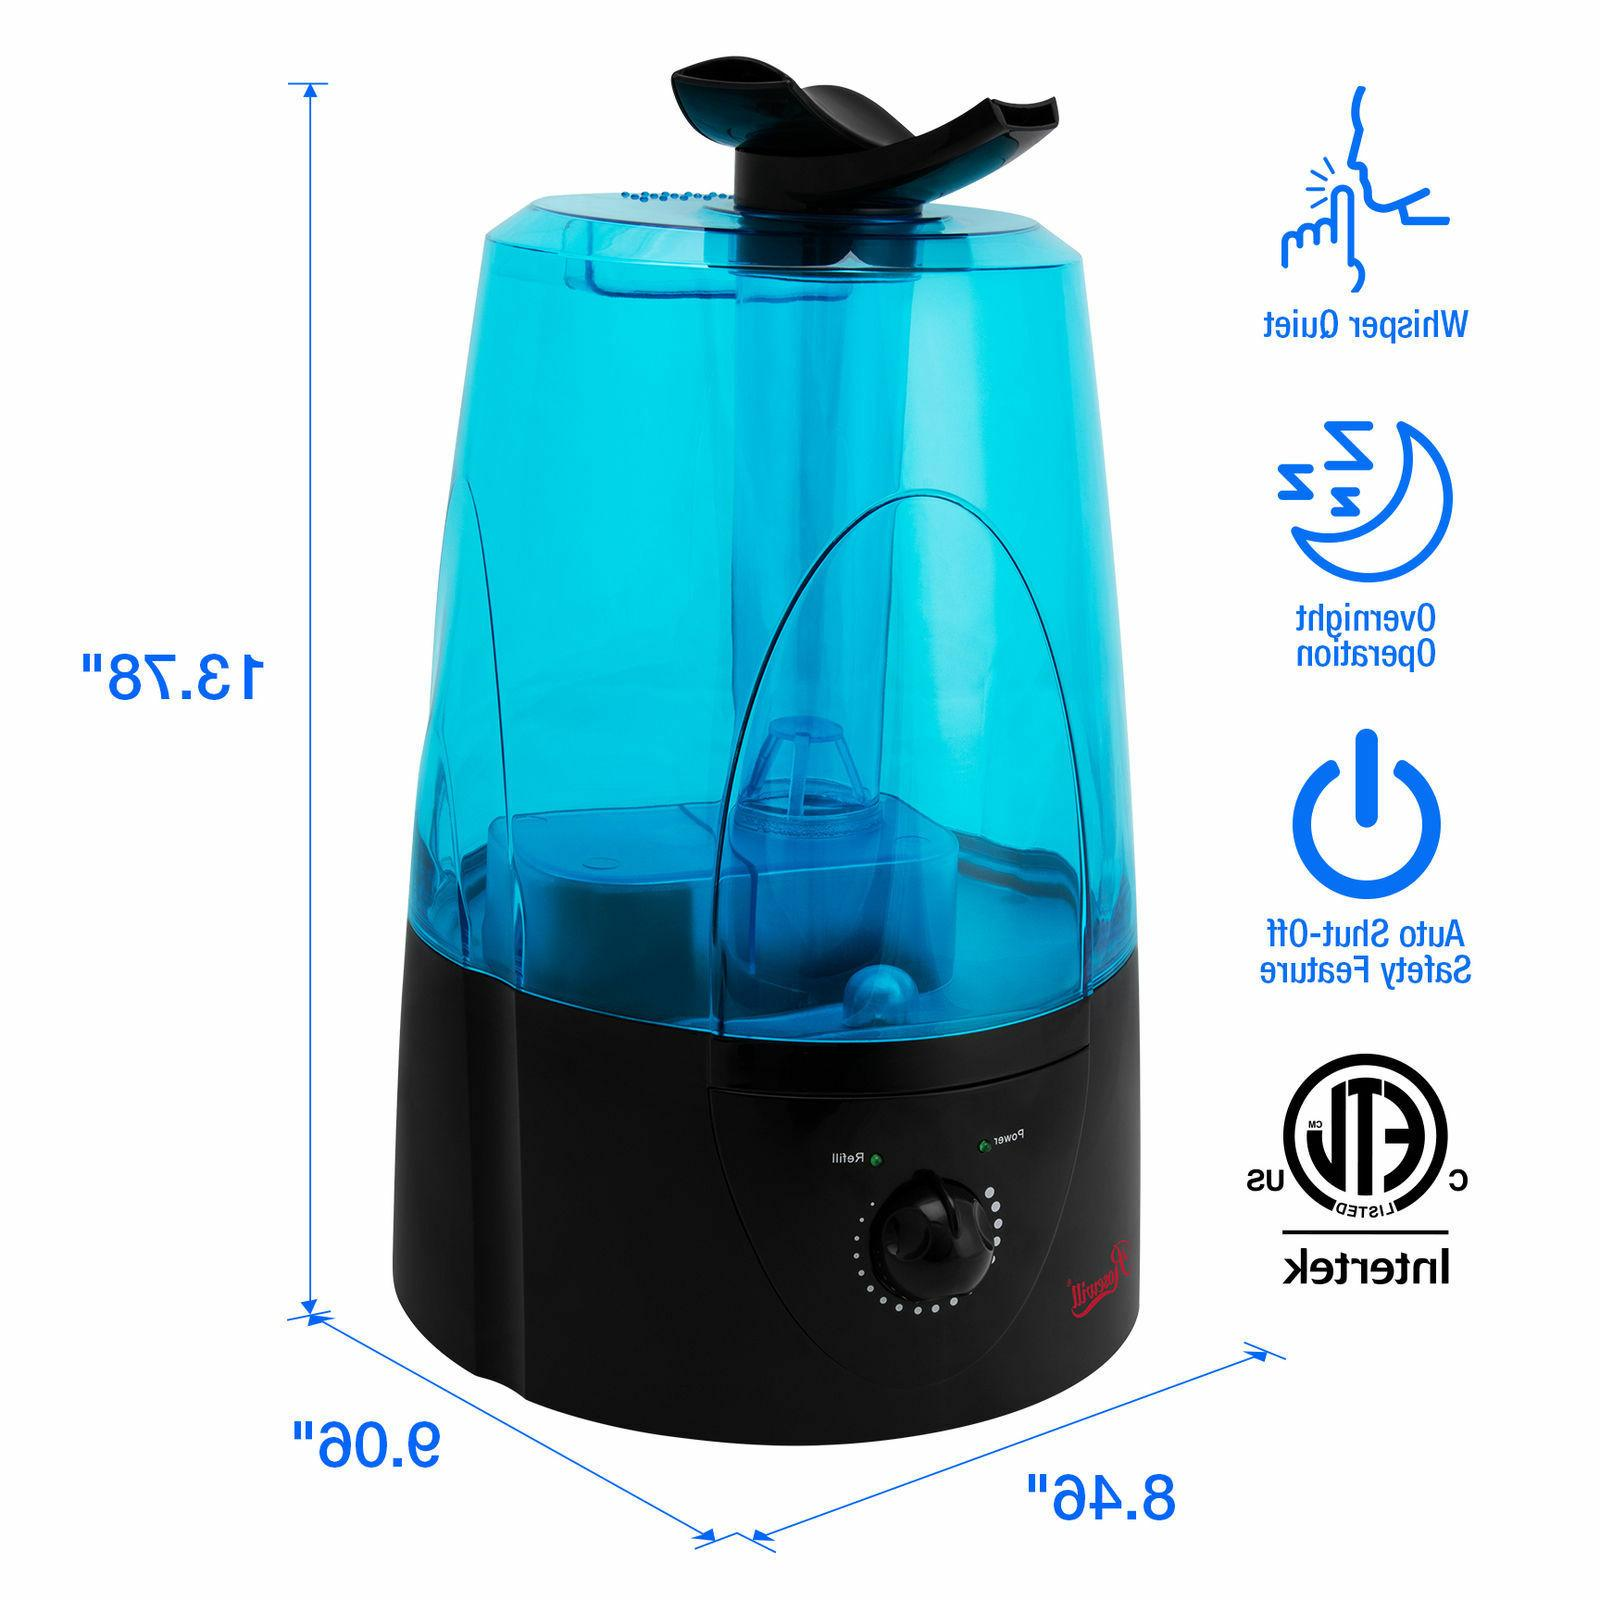 Brand Ultrasonic Humidifier Mist Quiet